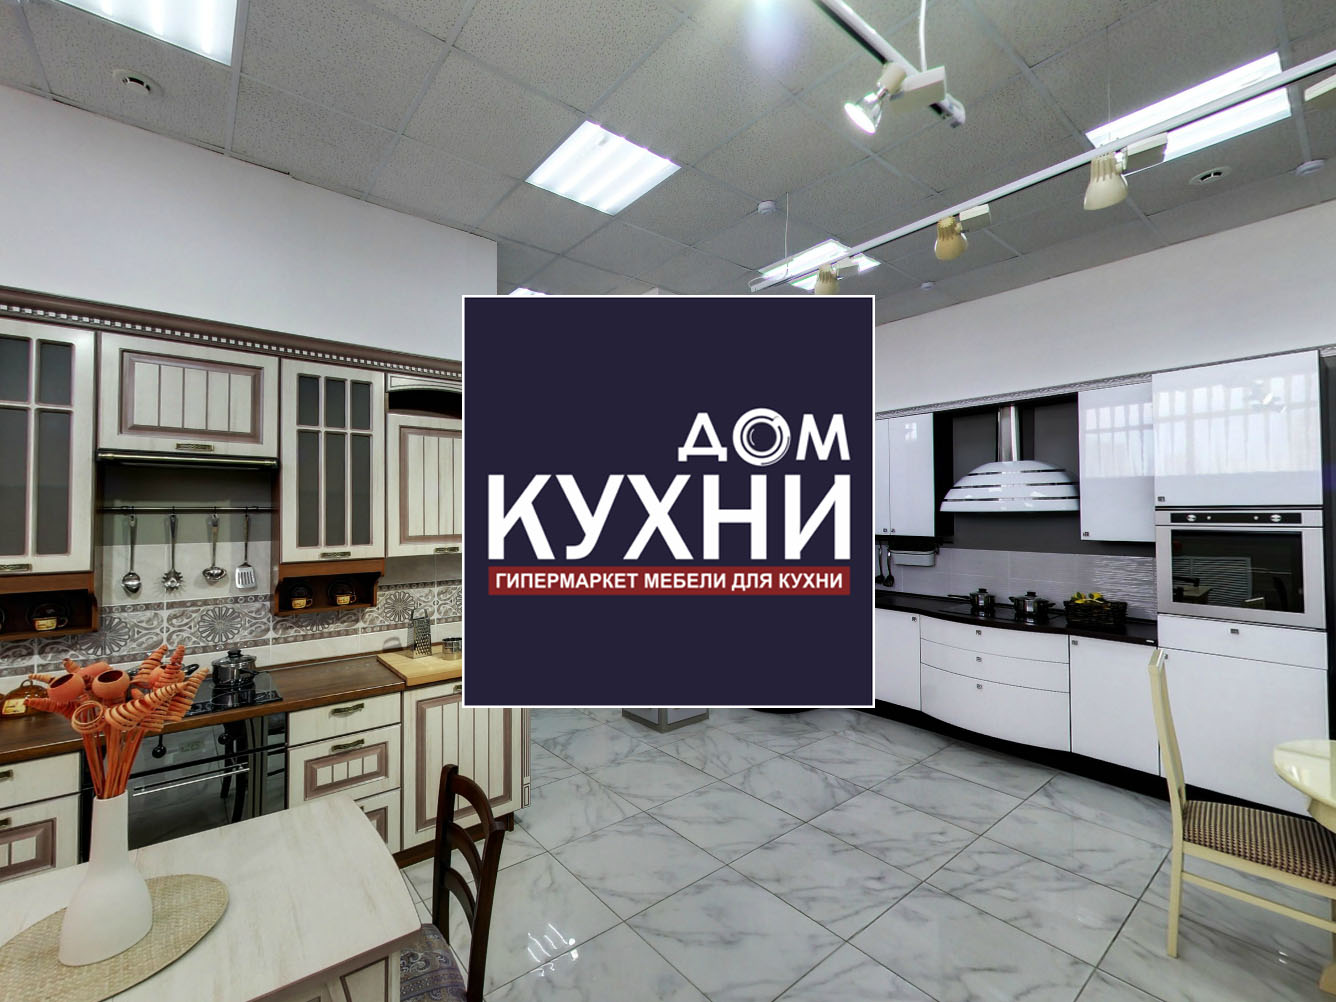 Дом КУХНИ, Фирменный салон